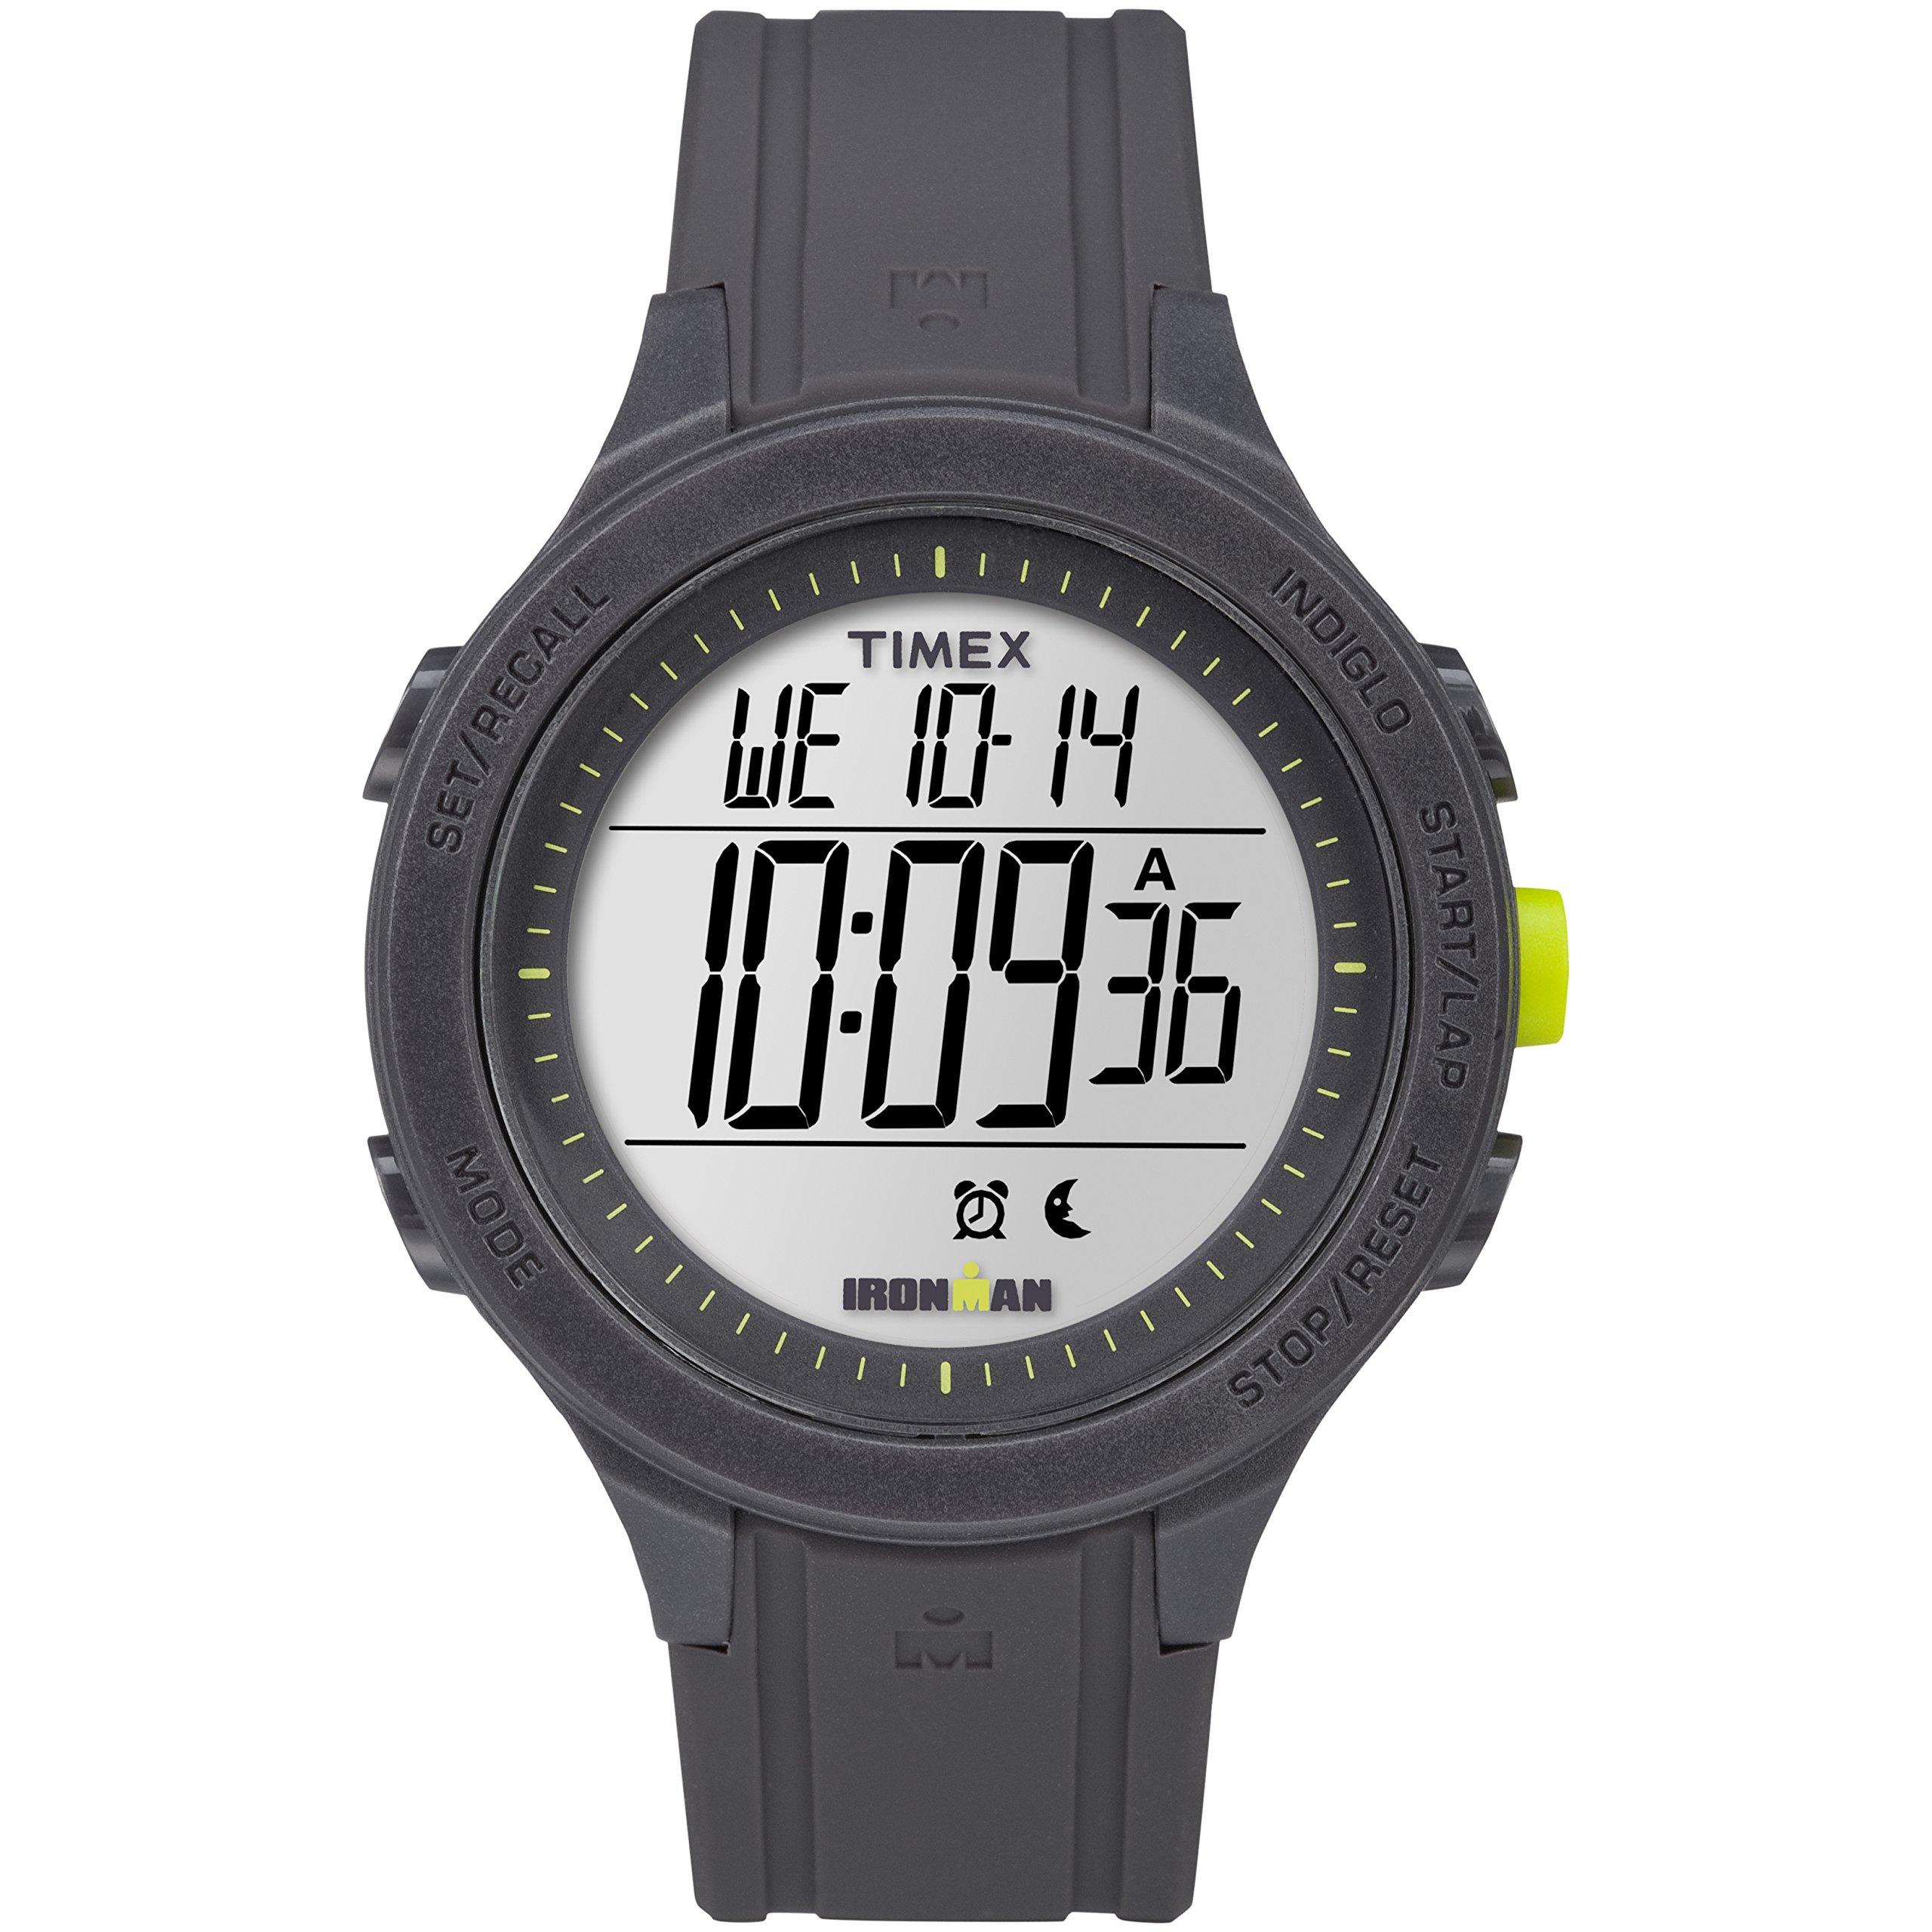 CDM product Timex Ironman Essential 30 Watch big image